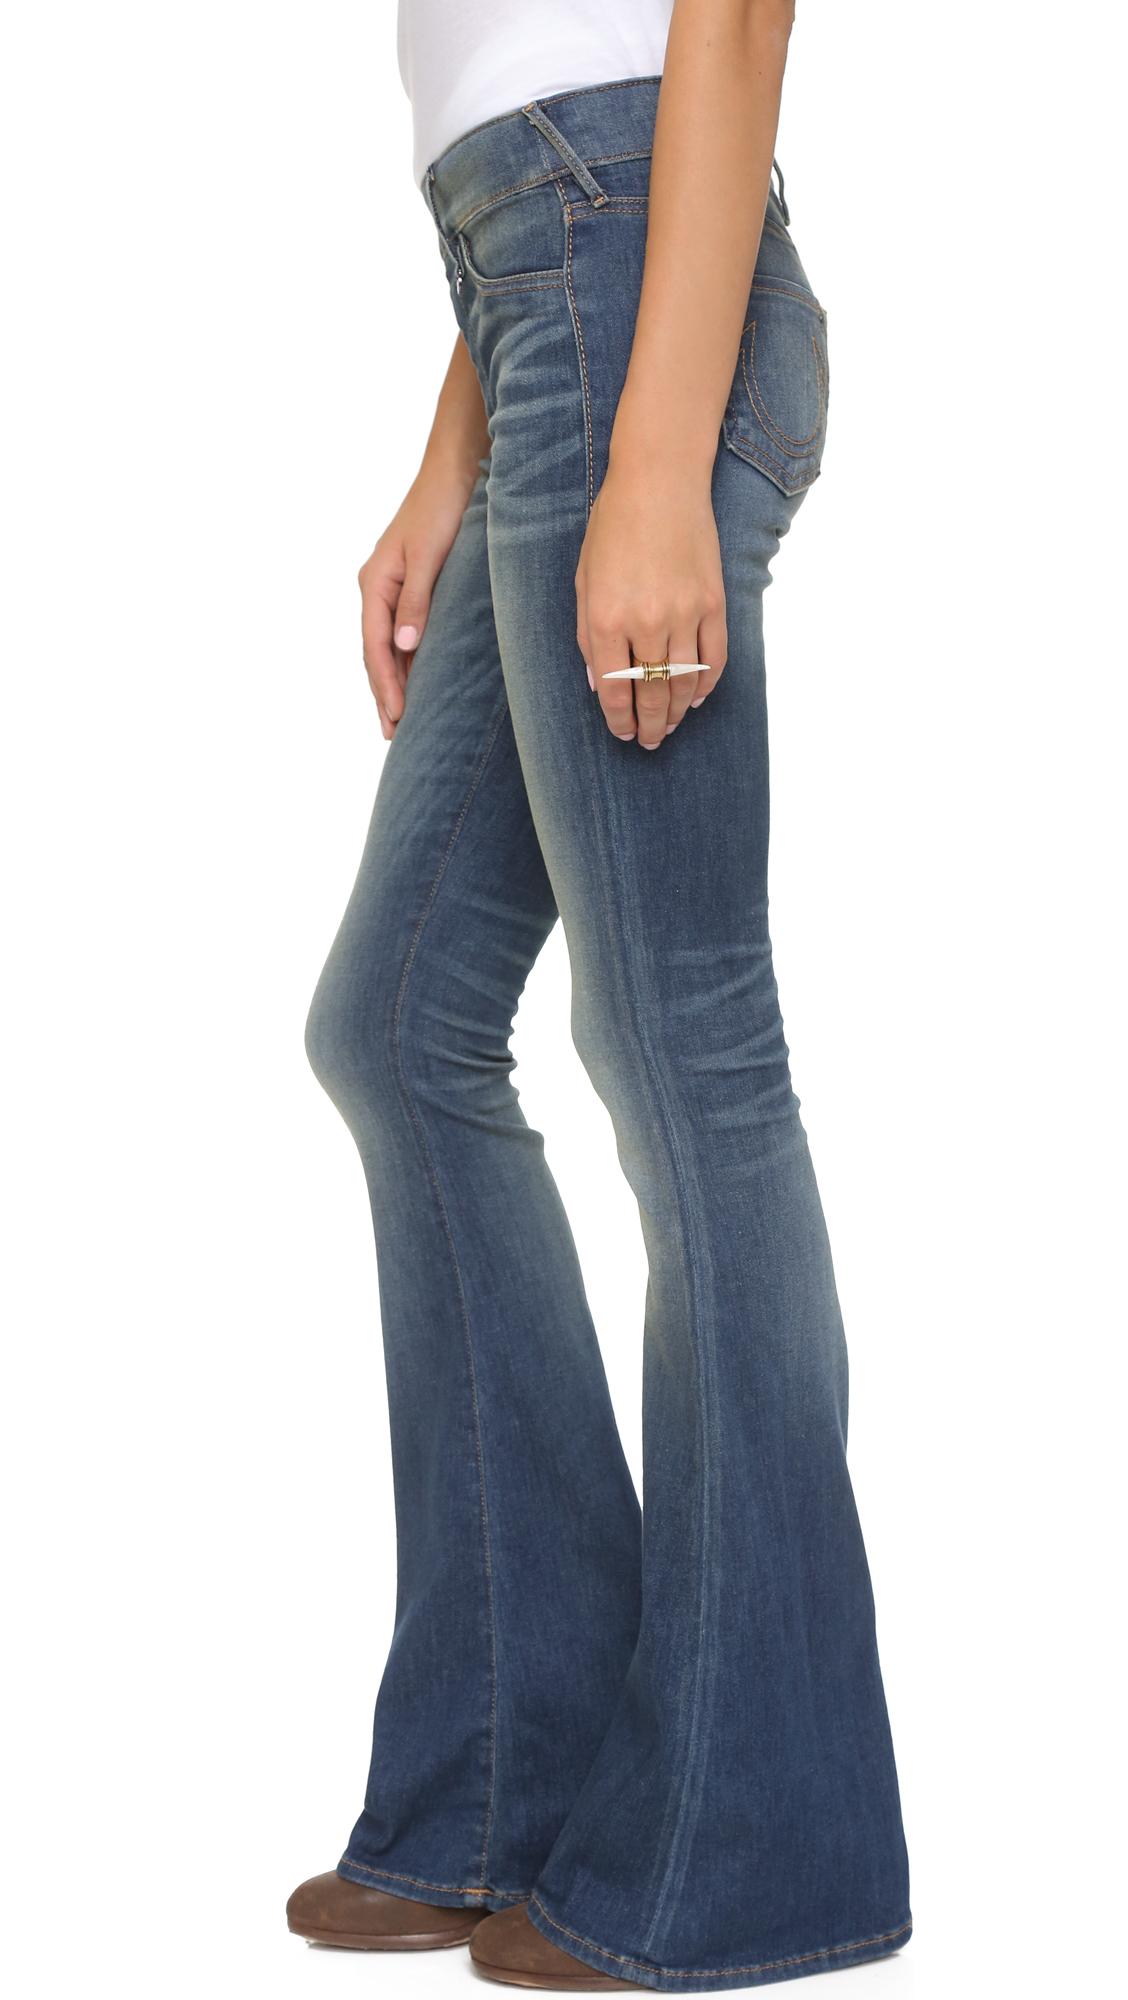 True Religion Denim Runway Pull On Flare Jeans in Blue